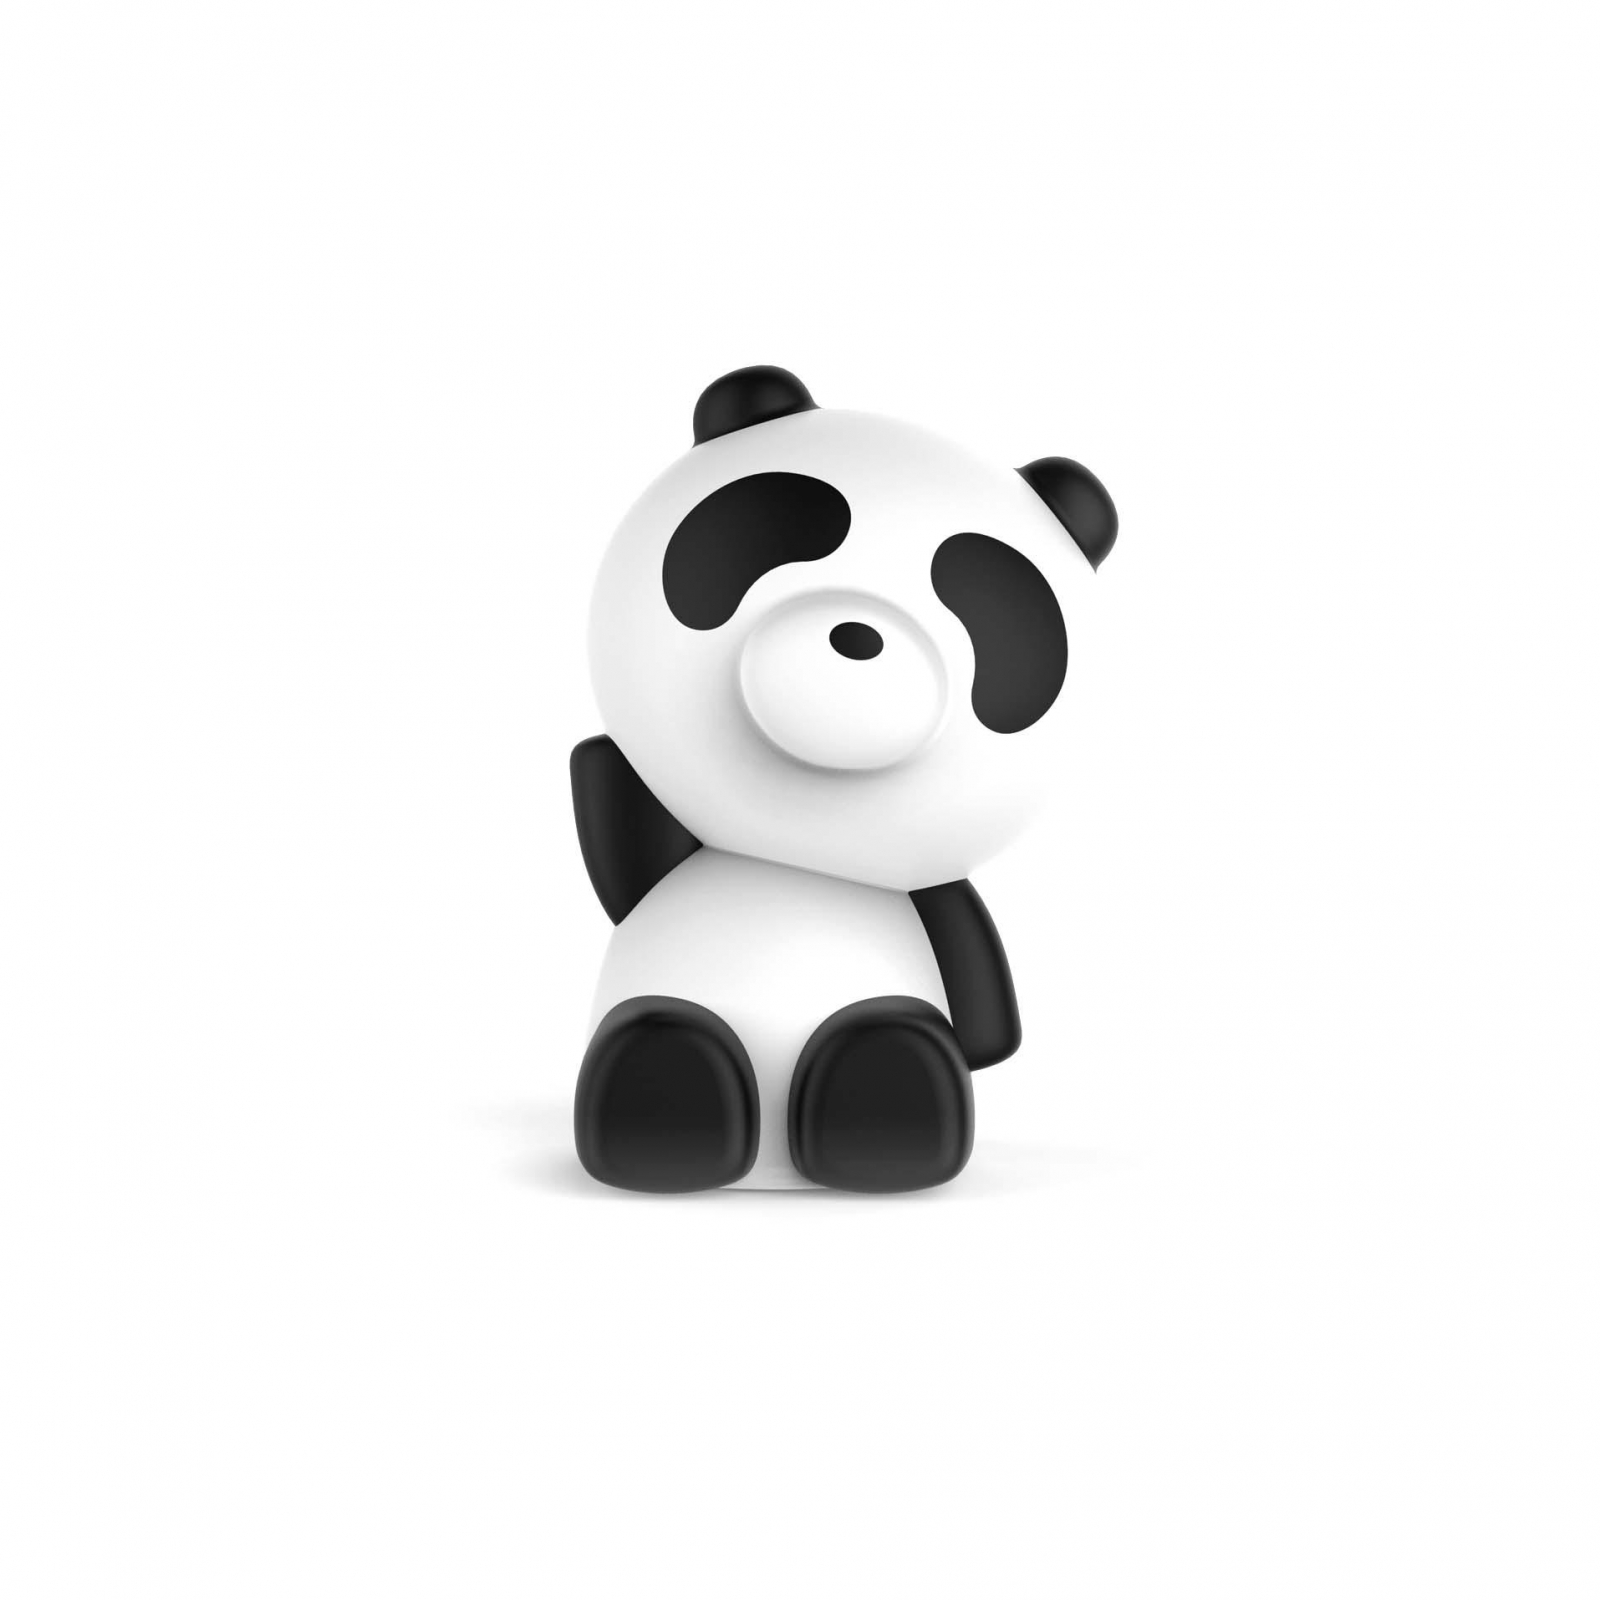 BOXA PORTABILA LUMINOASA BLUETOOTH PANDA BIGBEN, 33 CM imagine